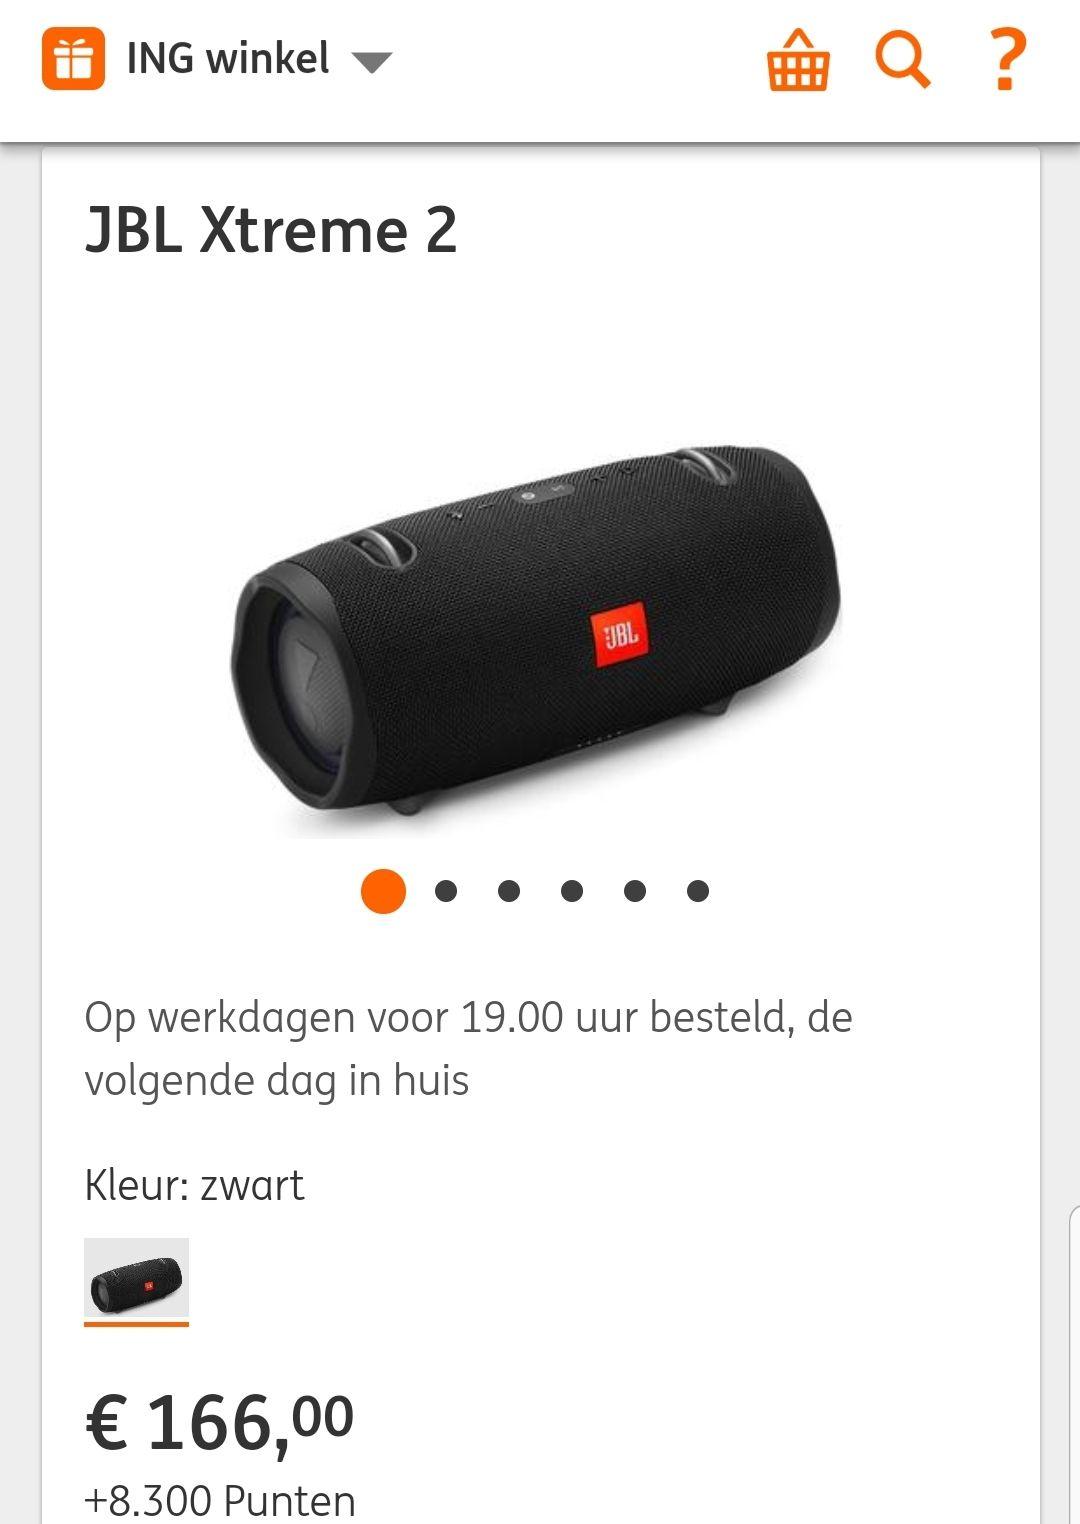 JBL Xtreme 2 elders 204,- euro